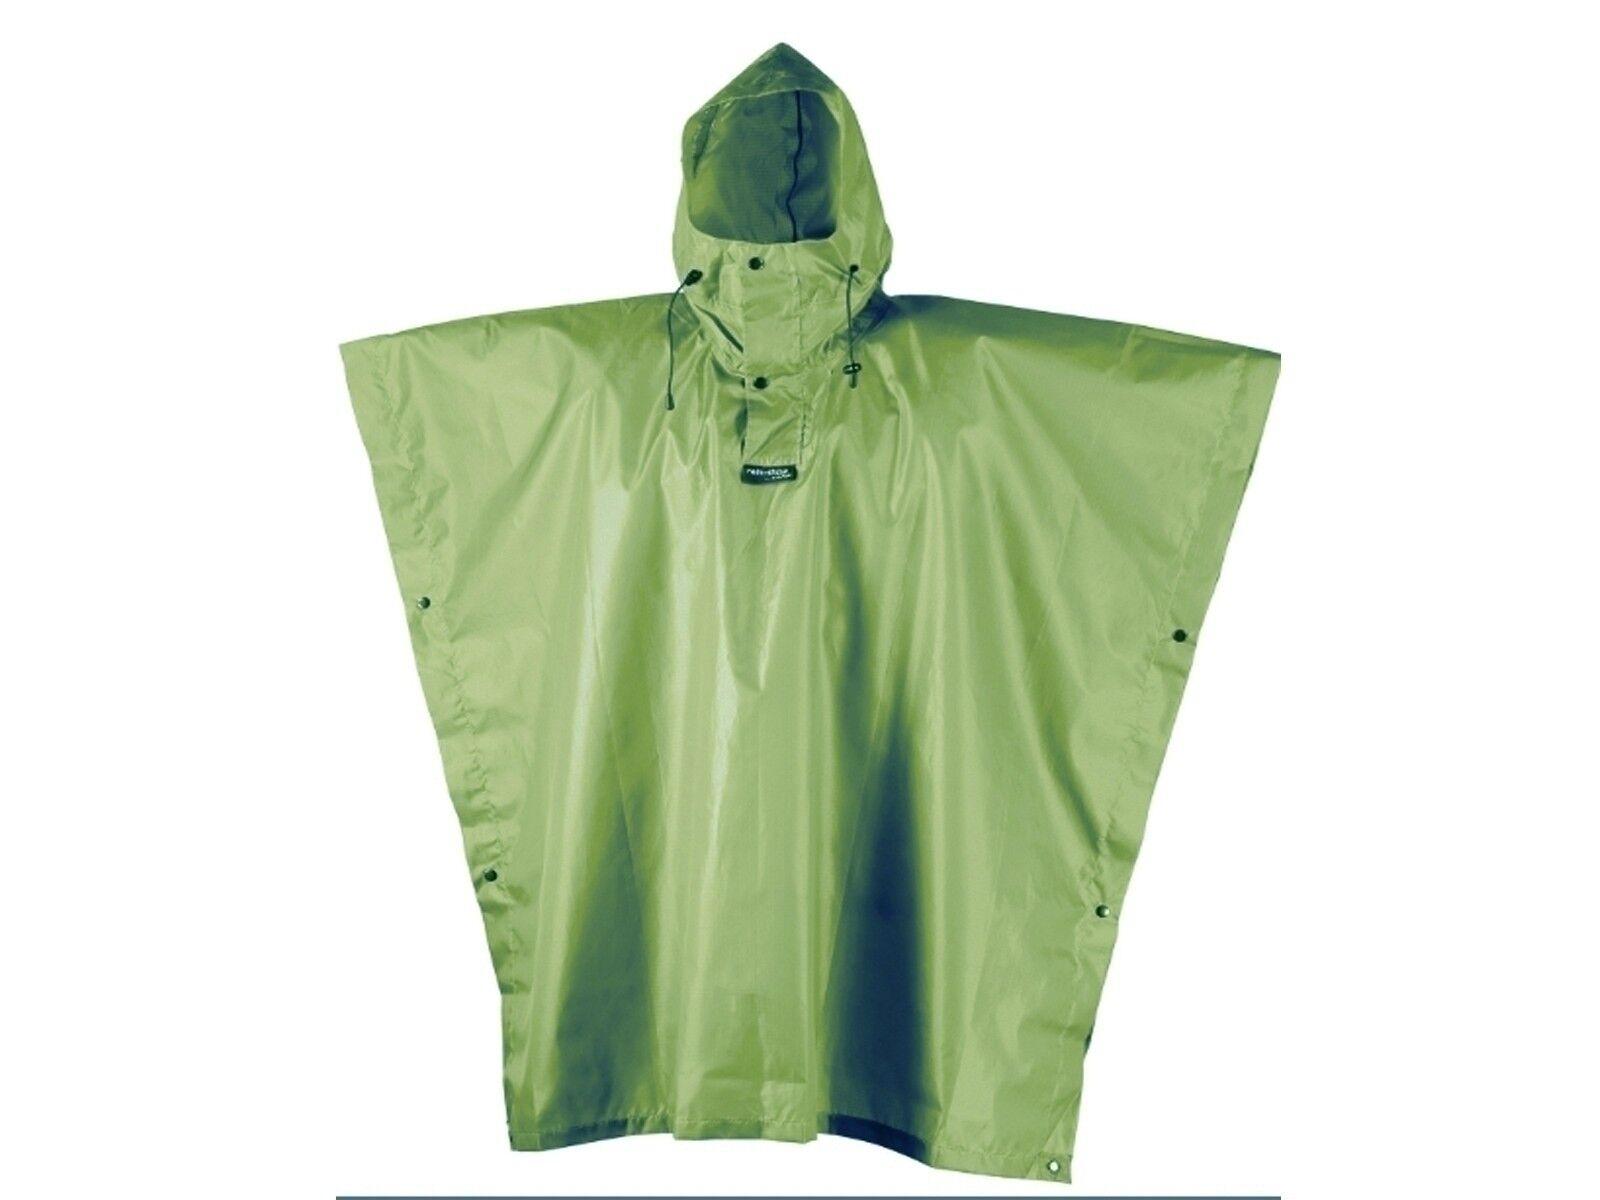 PONCHO UNISEX CAMP  1997 4 RAIN STOP green MILITARE